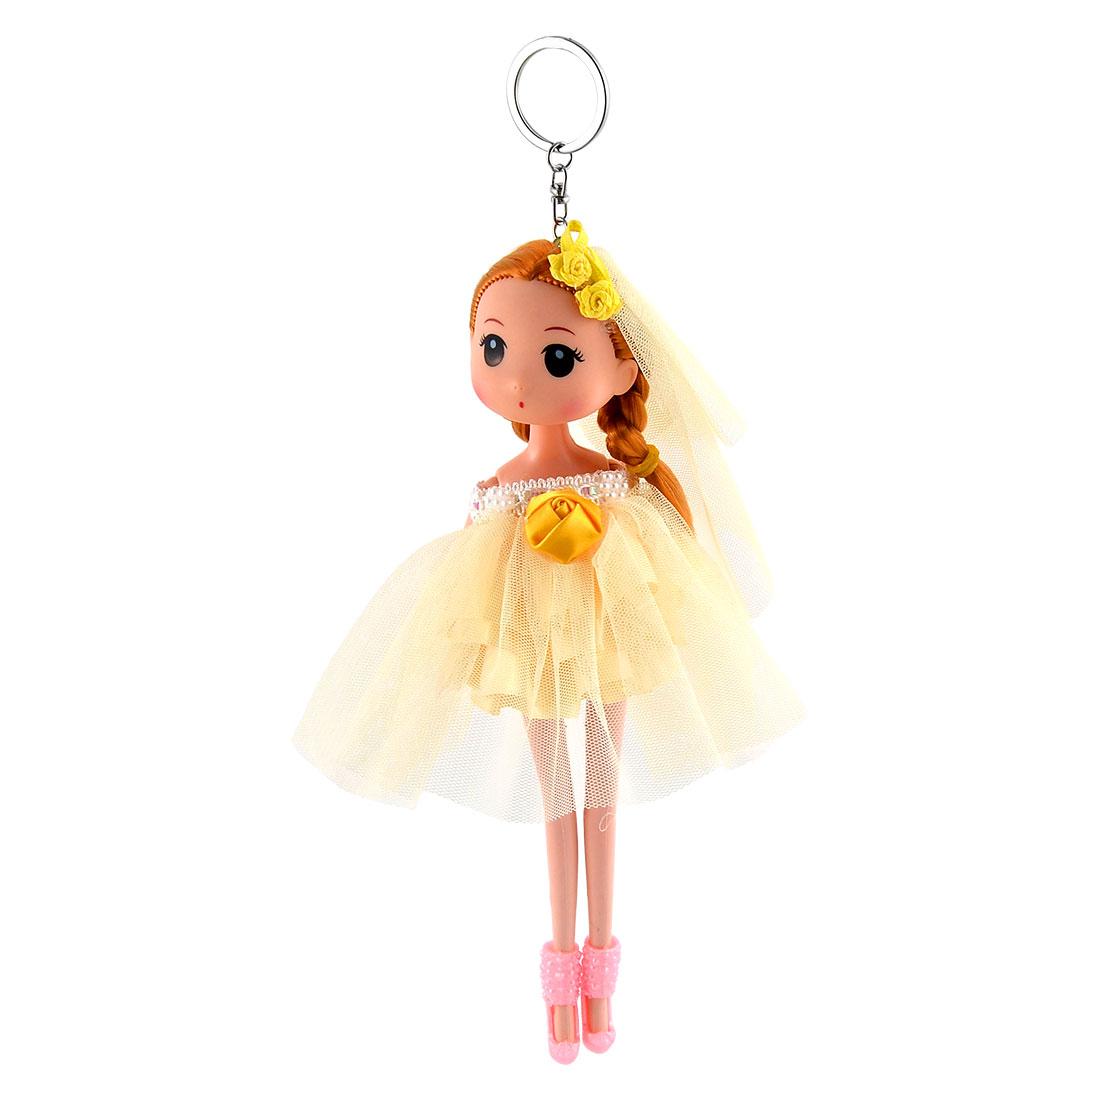 Girl Bag Wedding Dress Toy Ornament Charm Strap Doll Keychain Key Ring Yellow